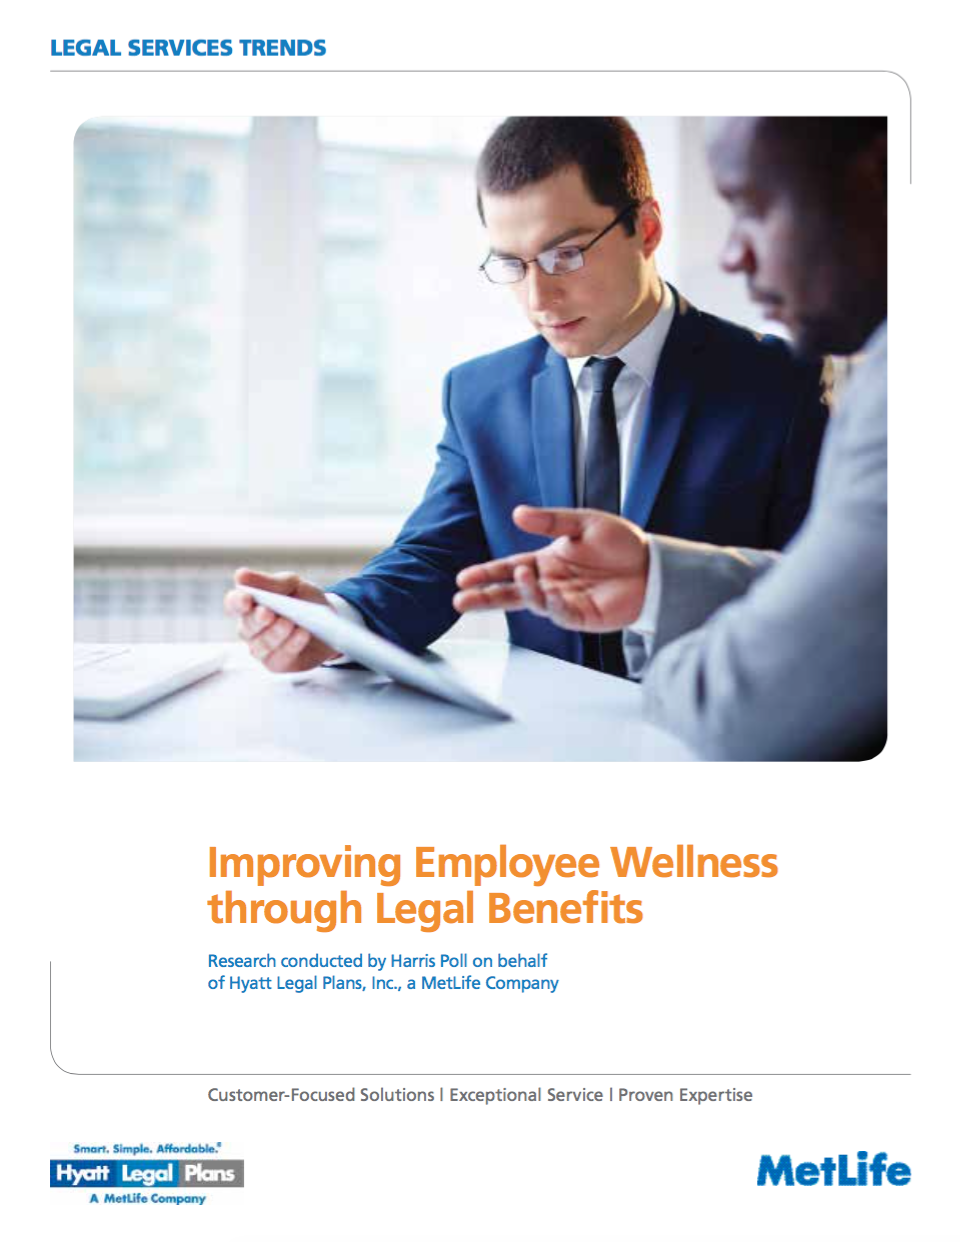 Improving Employee Wellness through Legal Benefits